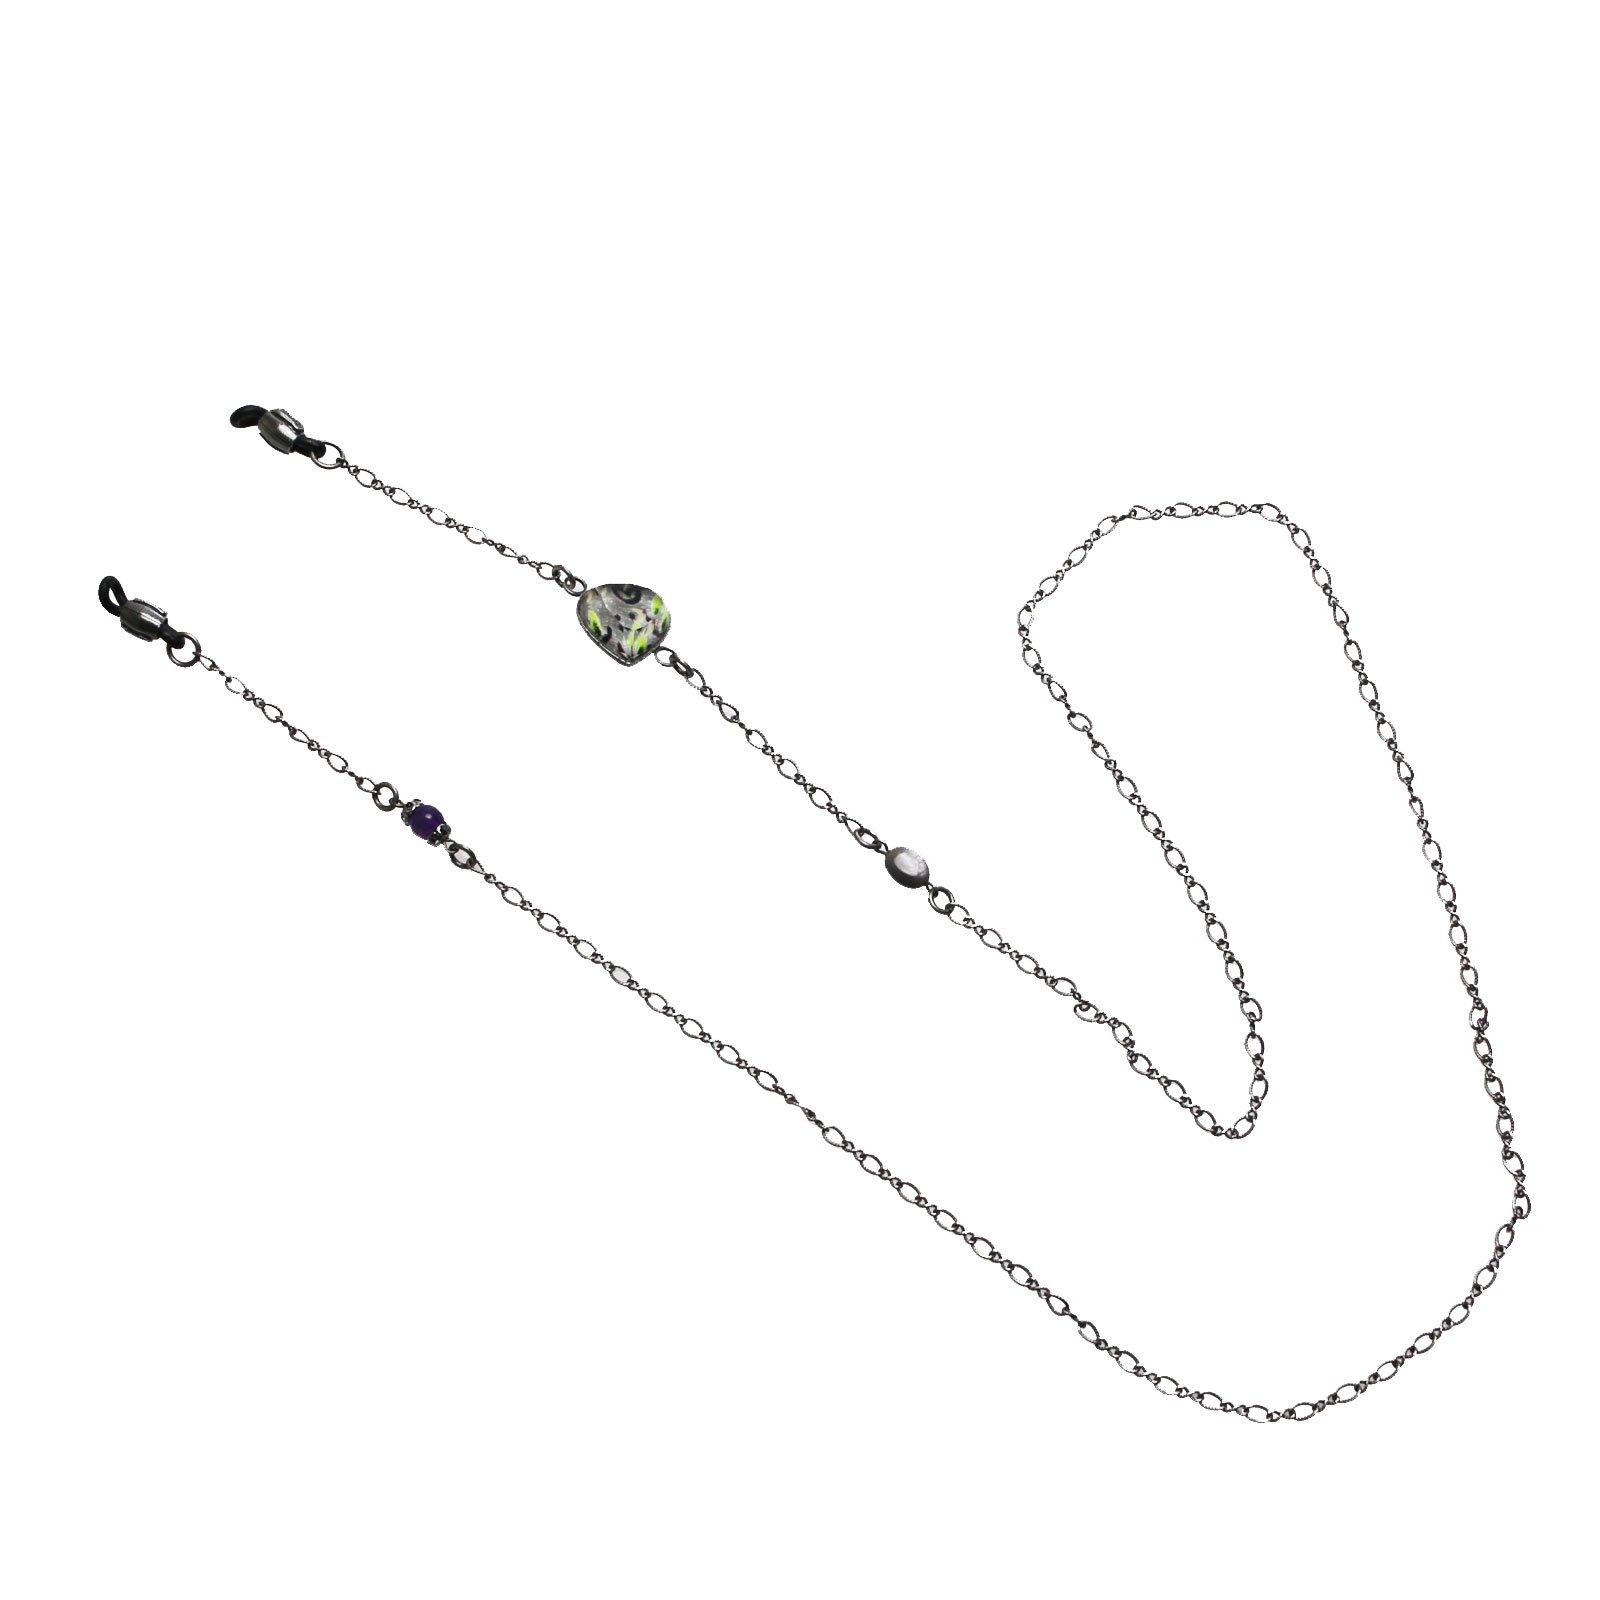 Tamarusan Eyewear Chain Heart Gray Shell Amethyst Unisex Eyeglasses Code by TAMARUSAN (Image #4)